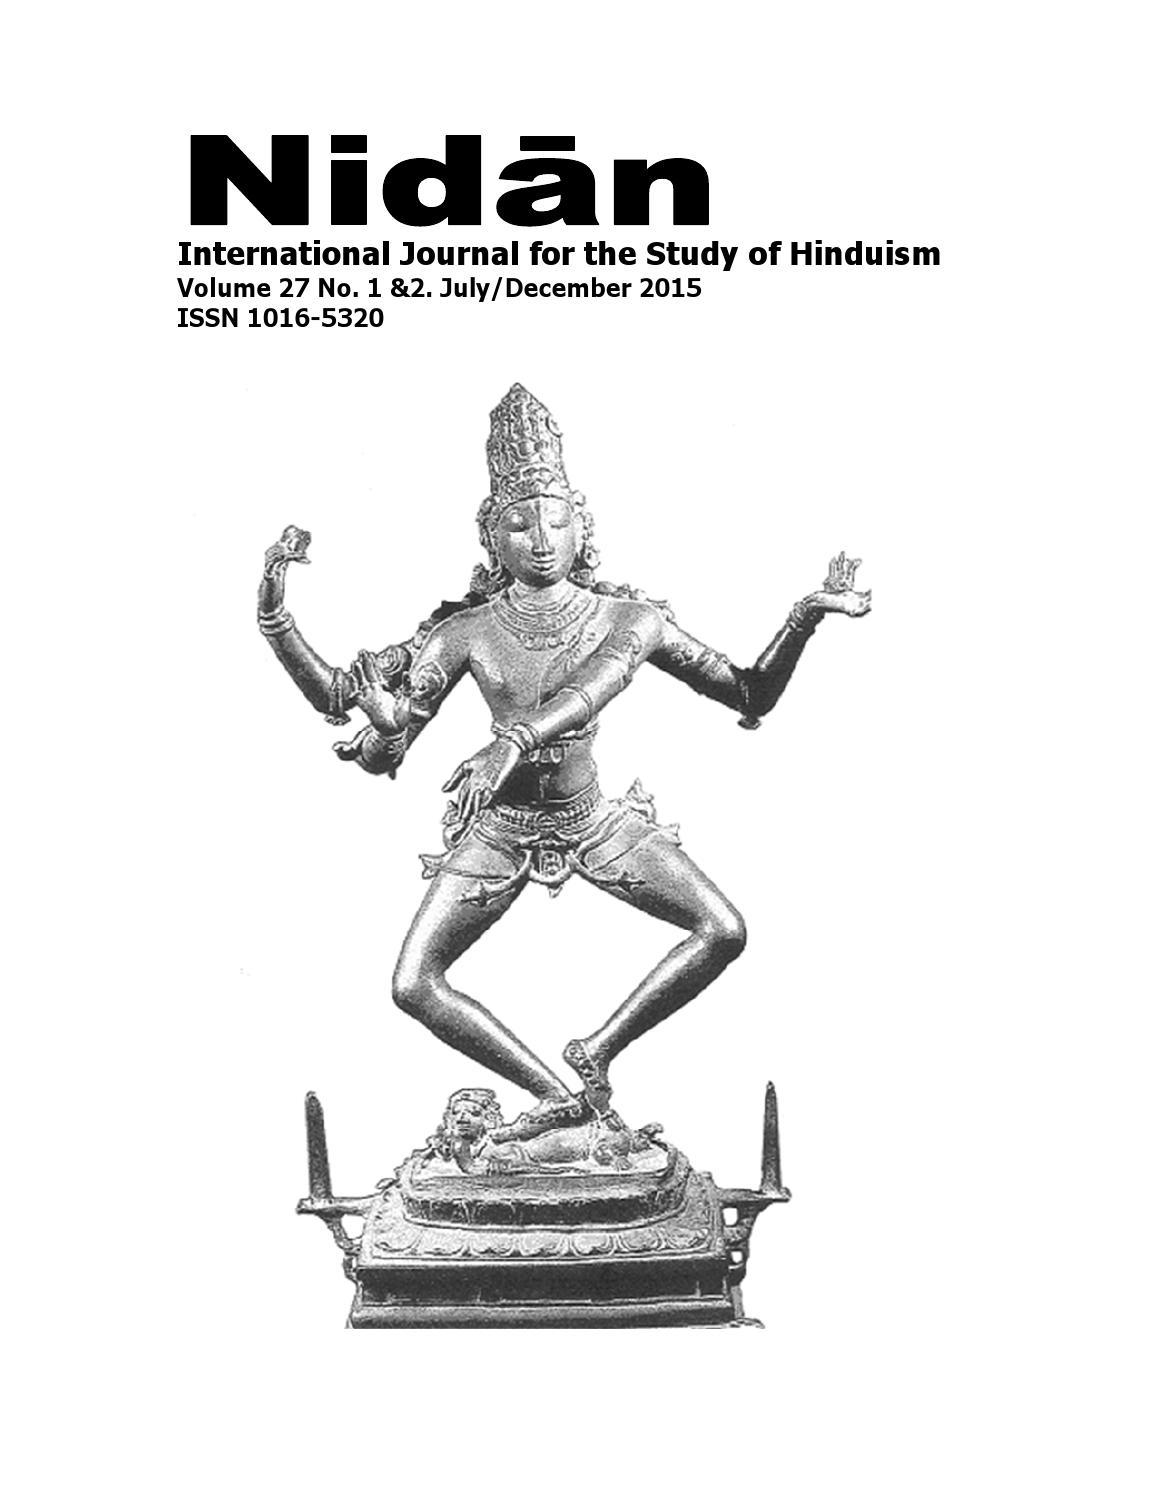 Nidan Volume 27 No. 1 & 2. July/December 2015 by UKZN